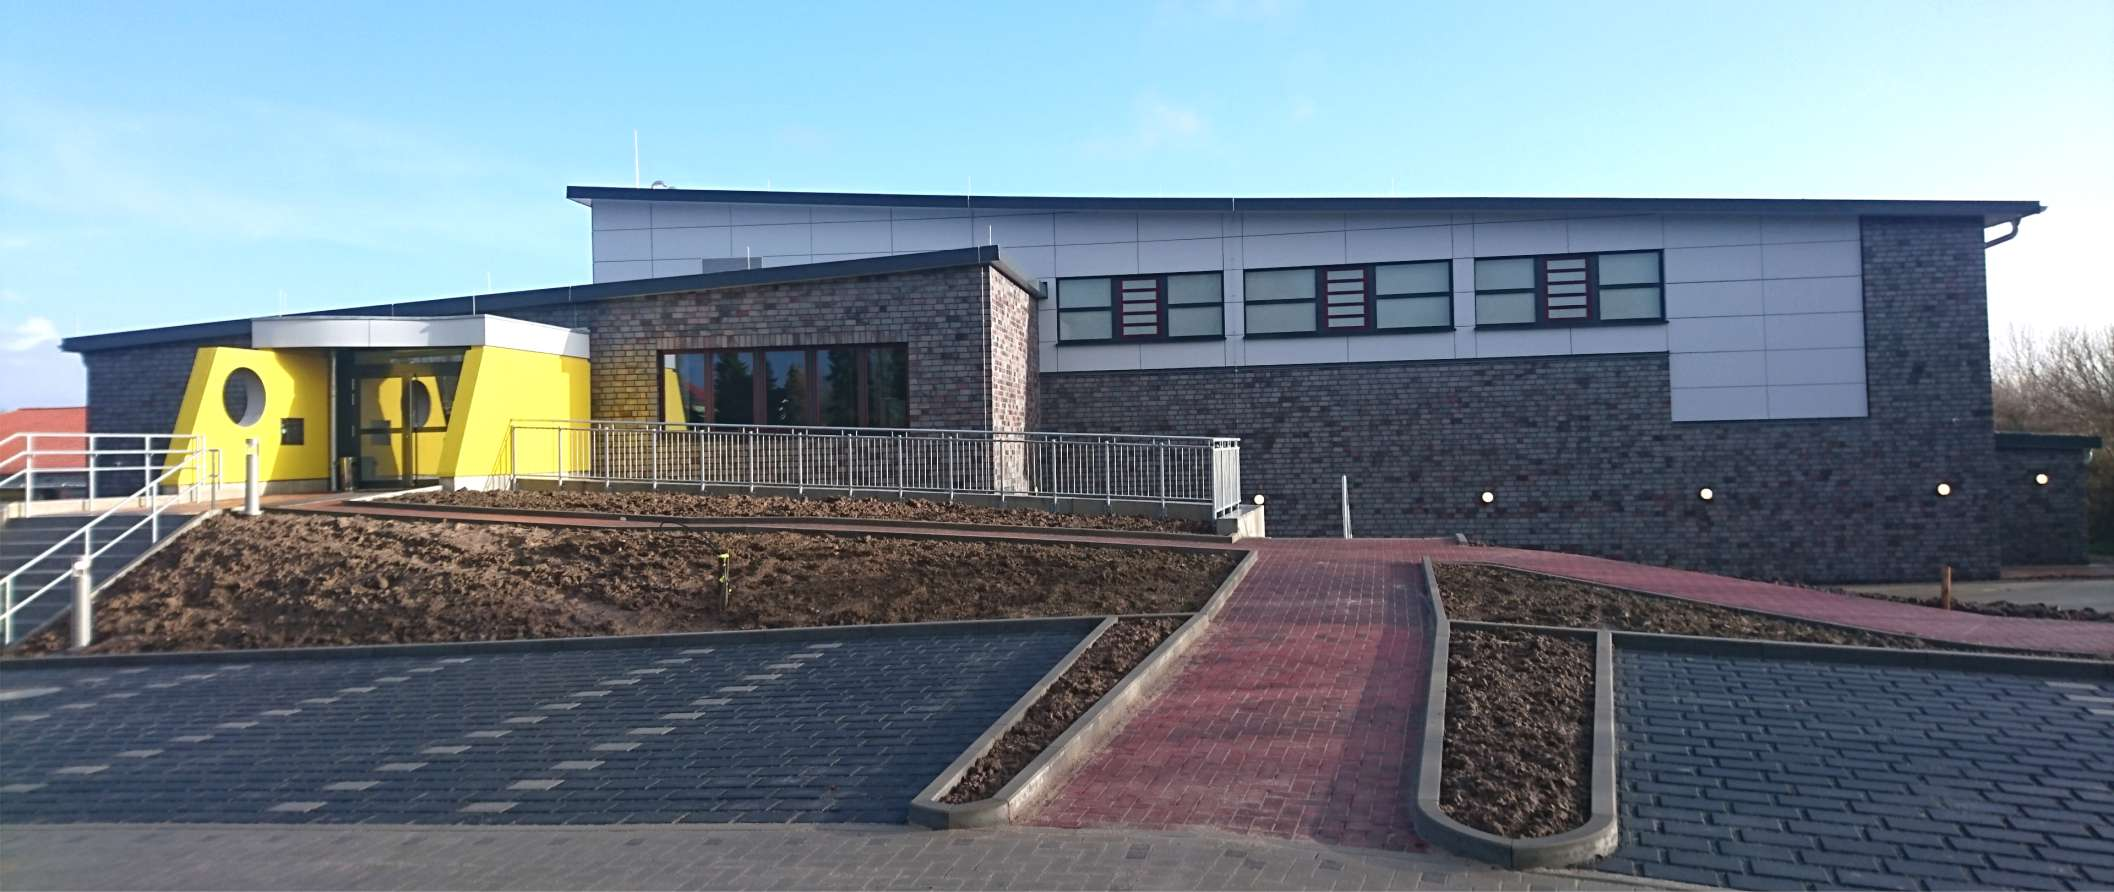 Dreifeldsporthalle | Neubau - Architekturbüro Freinsheimer